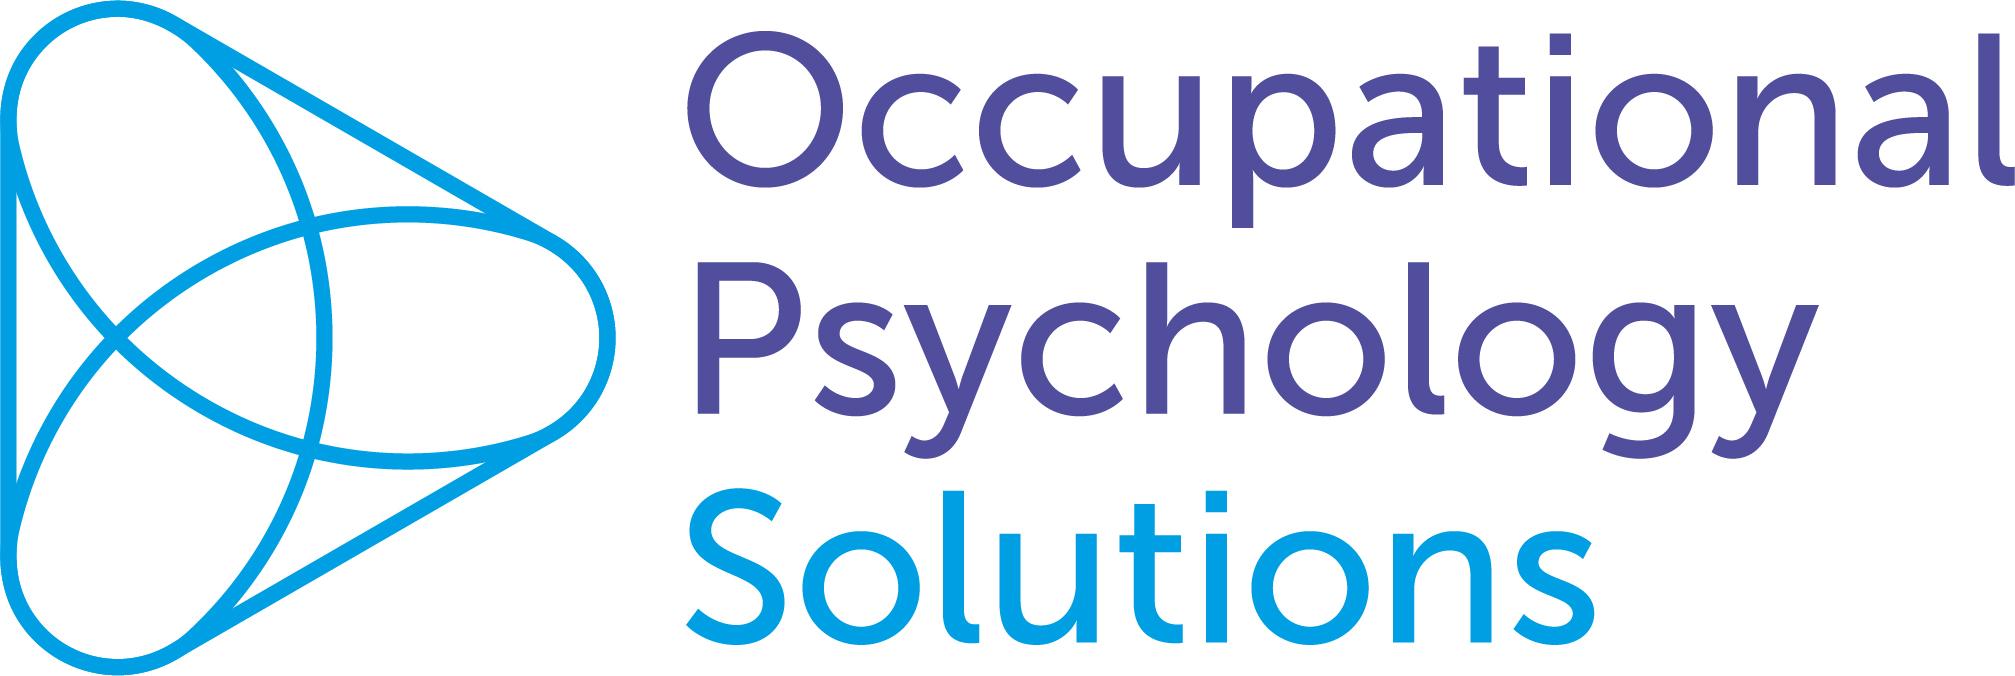 Occupational Psychology Solutions Ltd